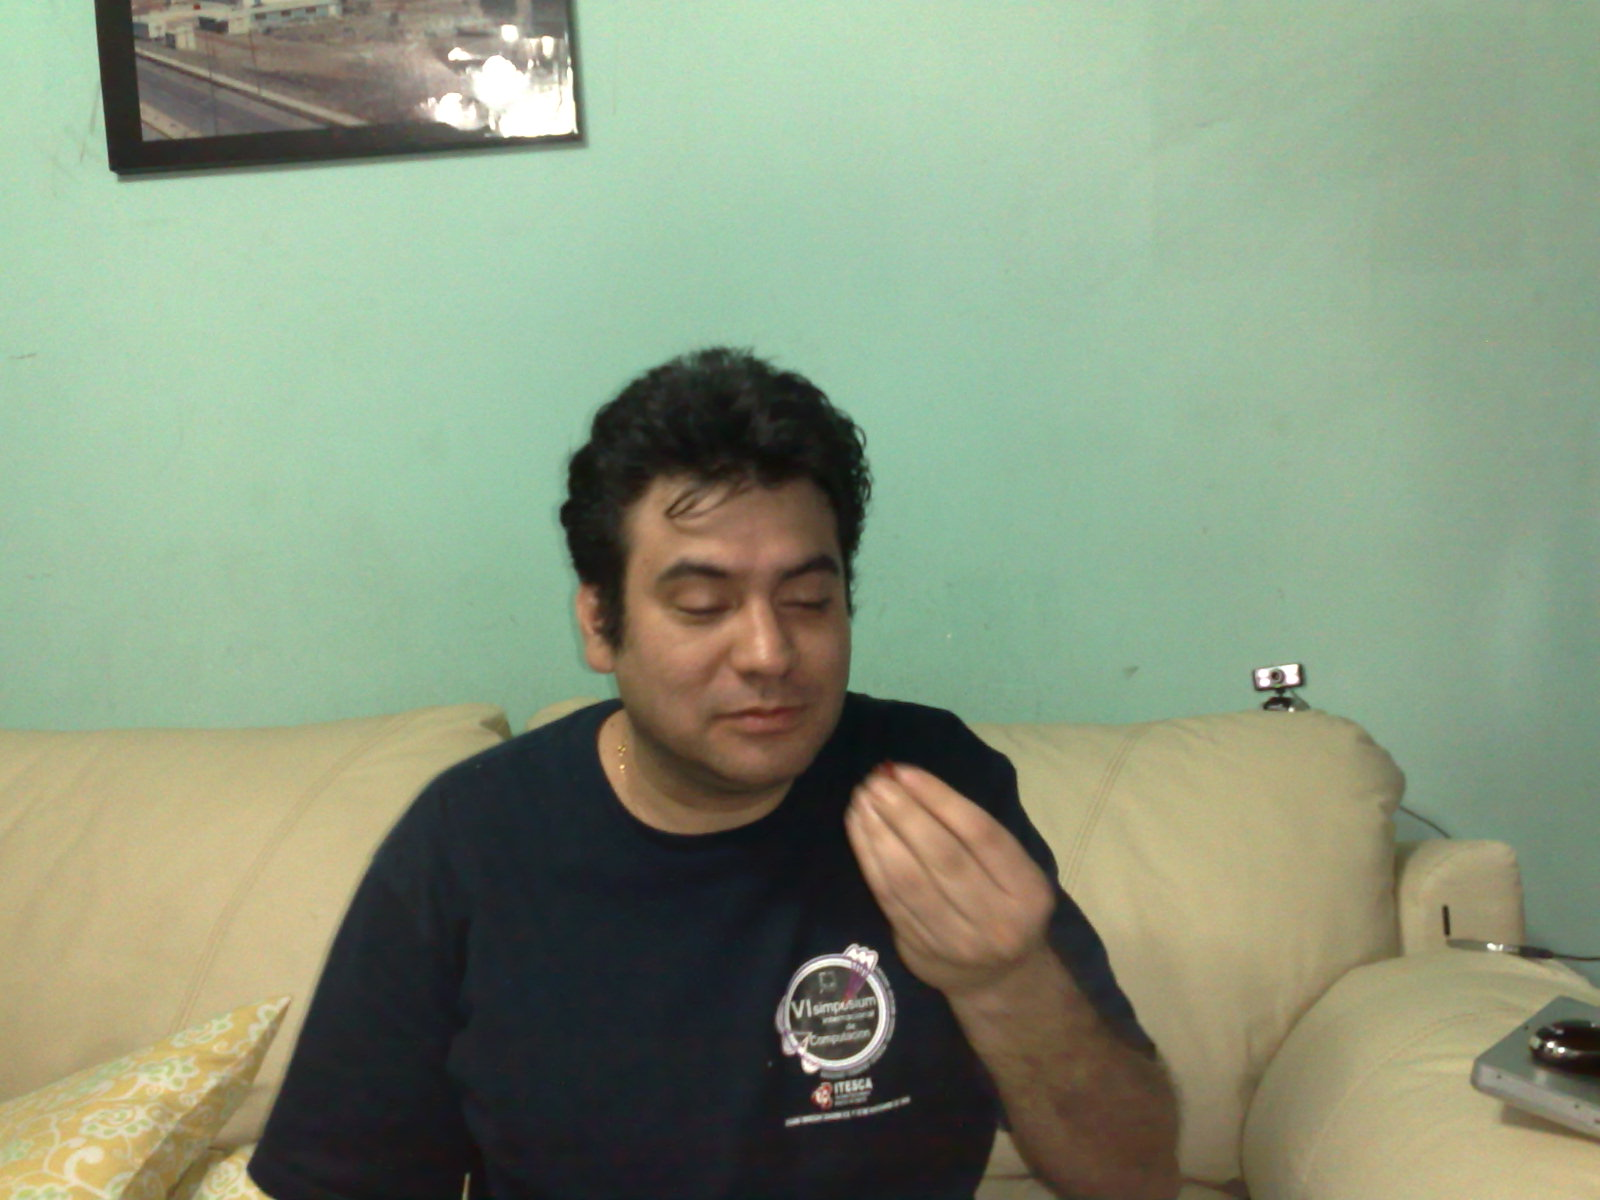 Sandino ponders a chile de árbol